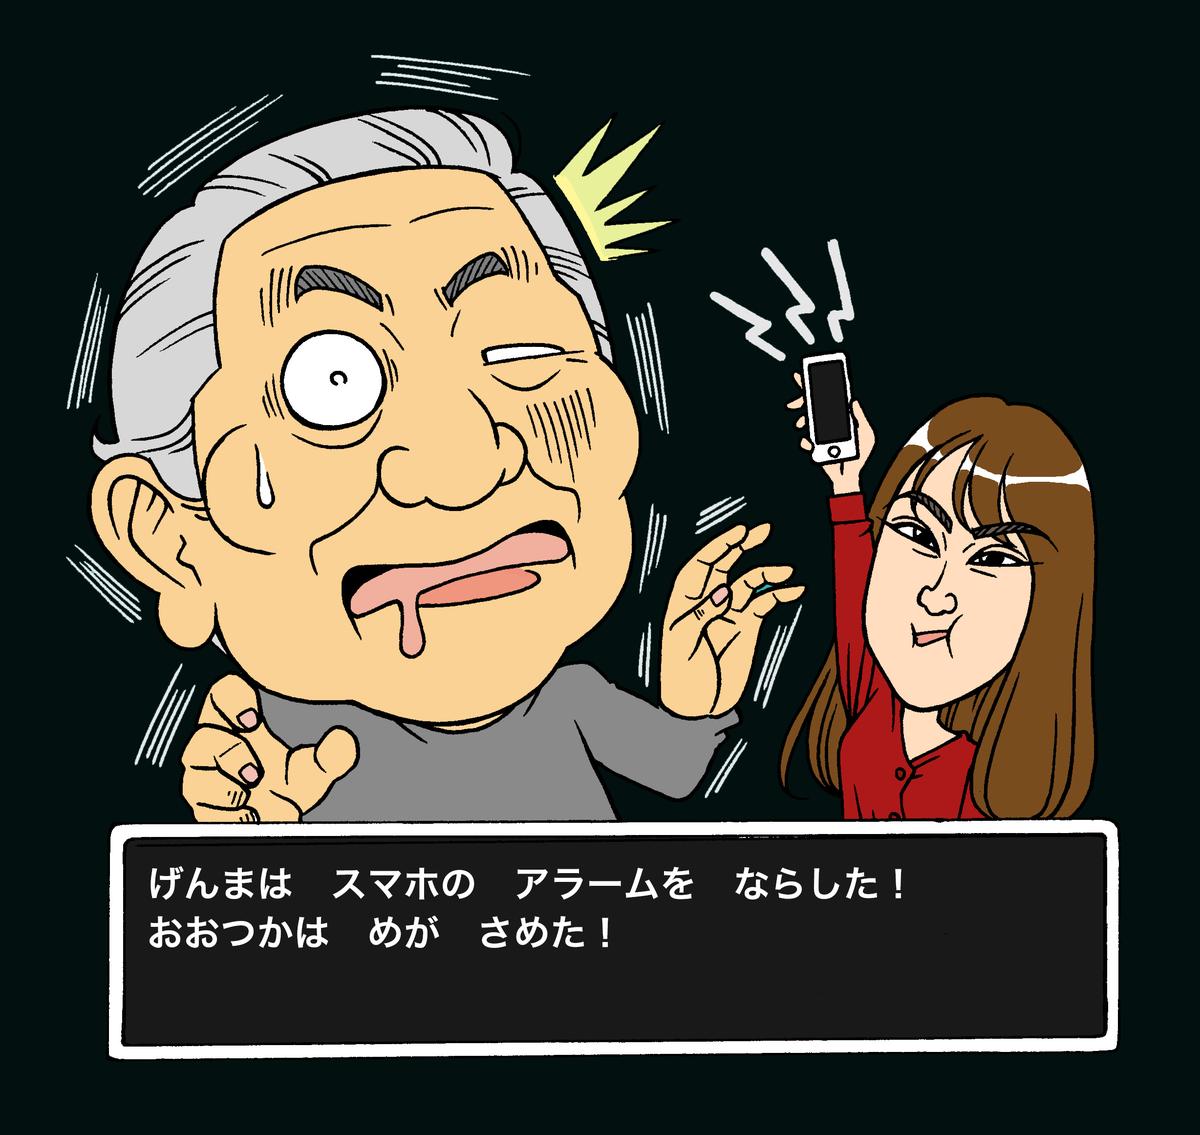 f:id:nigaoe29:20210528192758p:plain